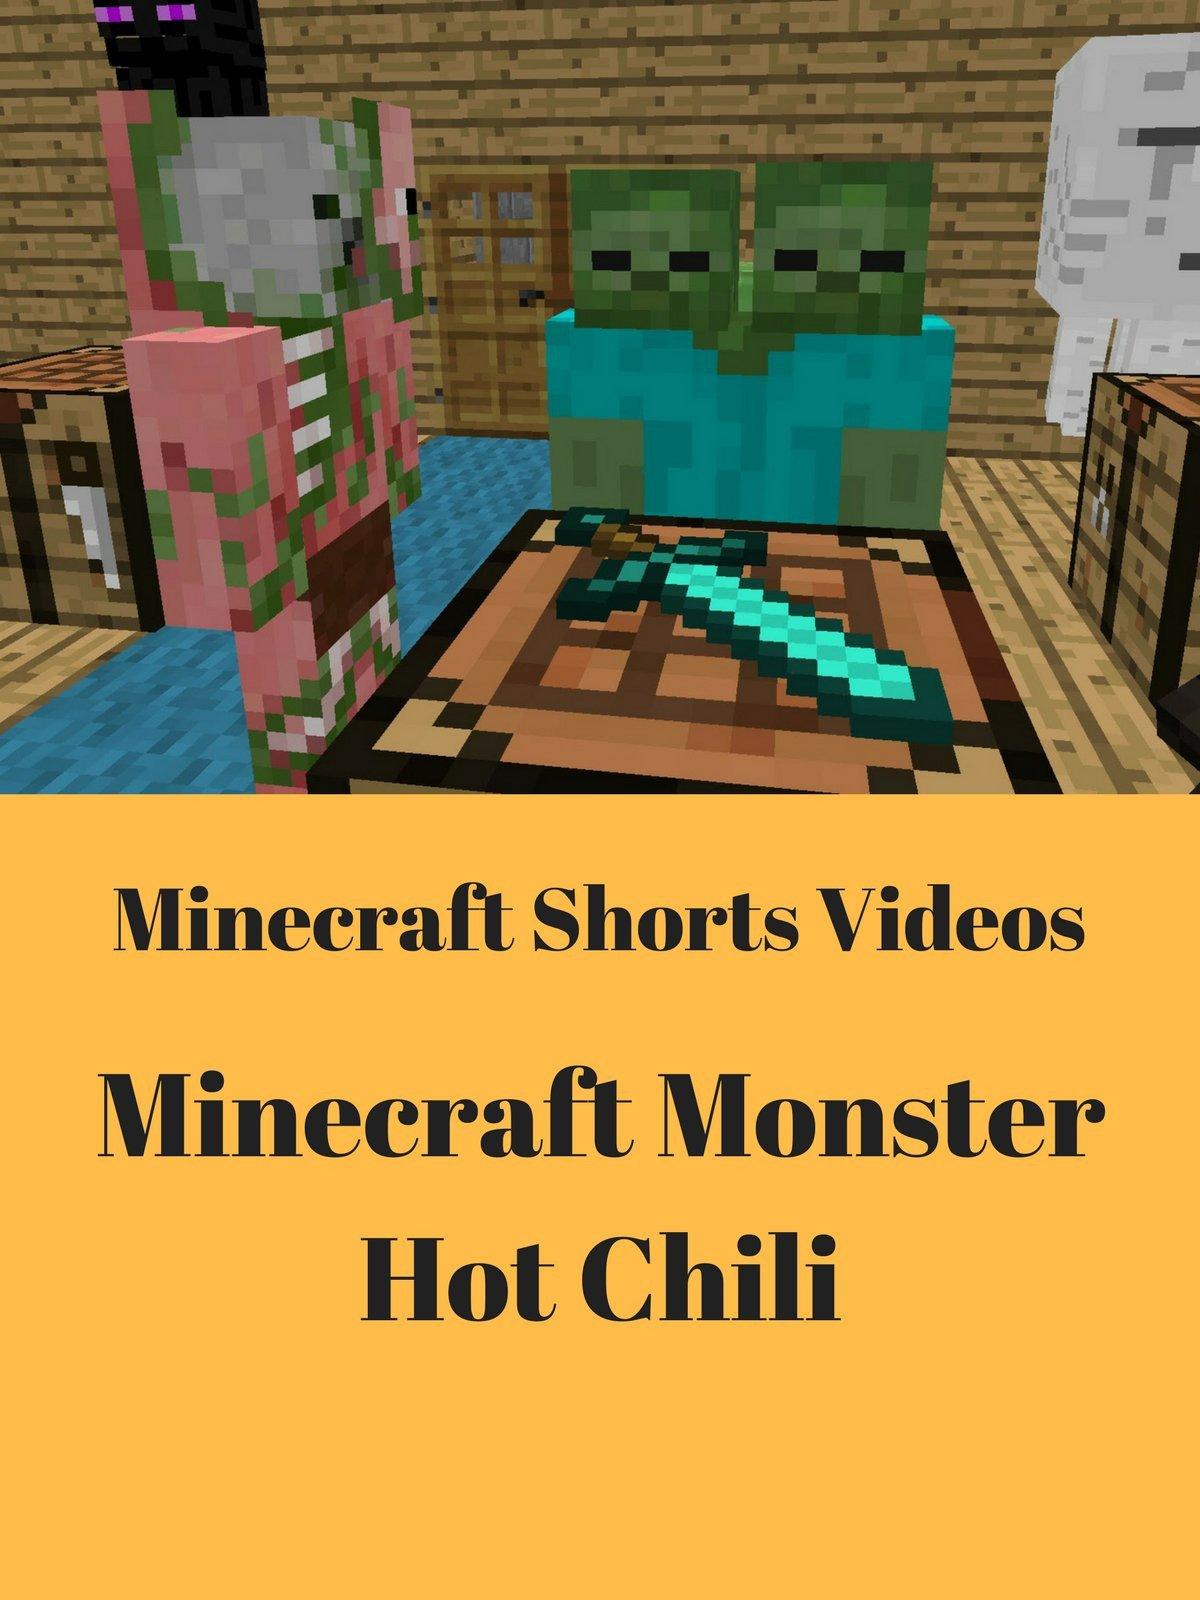 Minecraft Shorts Video:Minecraft Monster Hot Chili